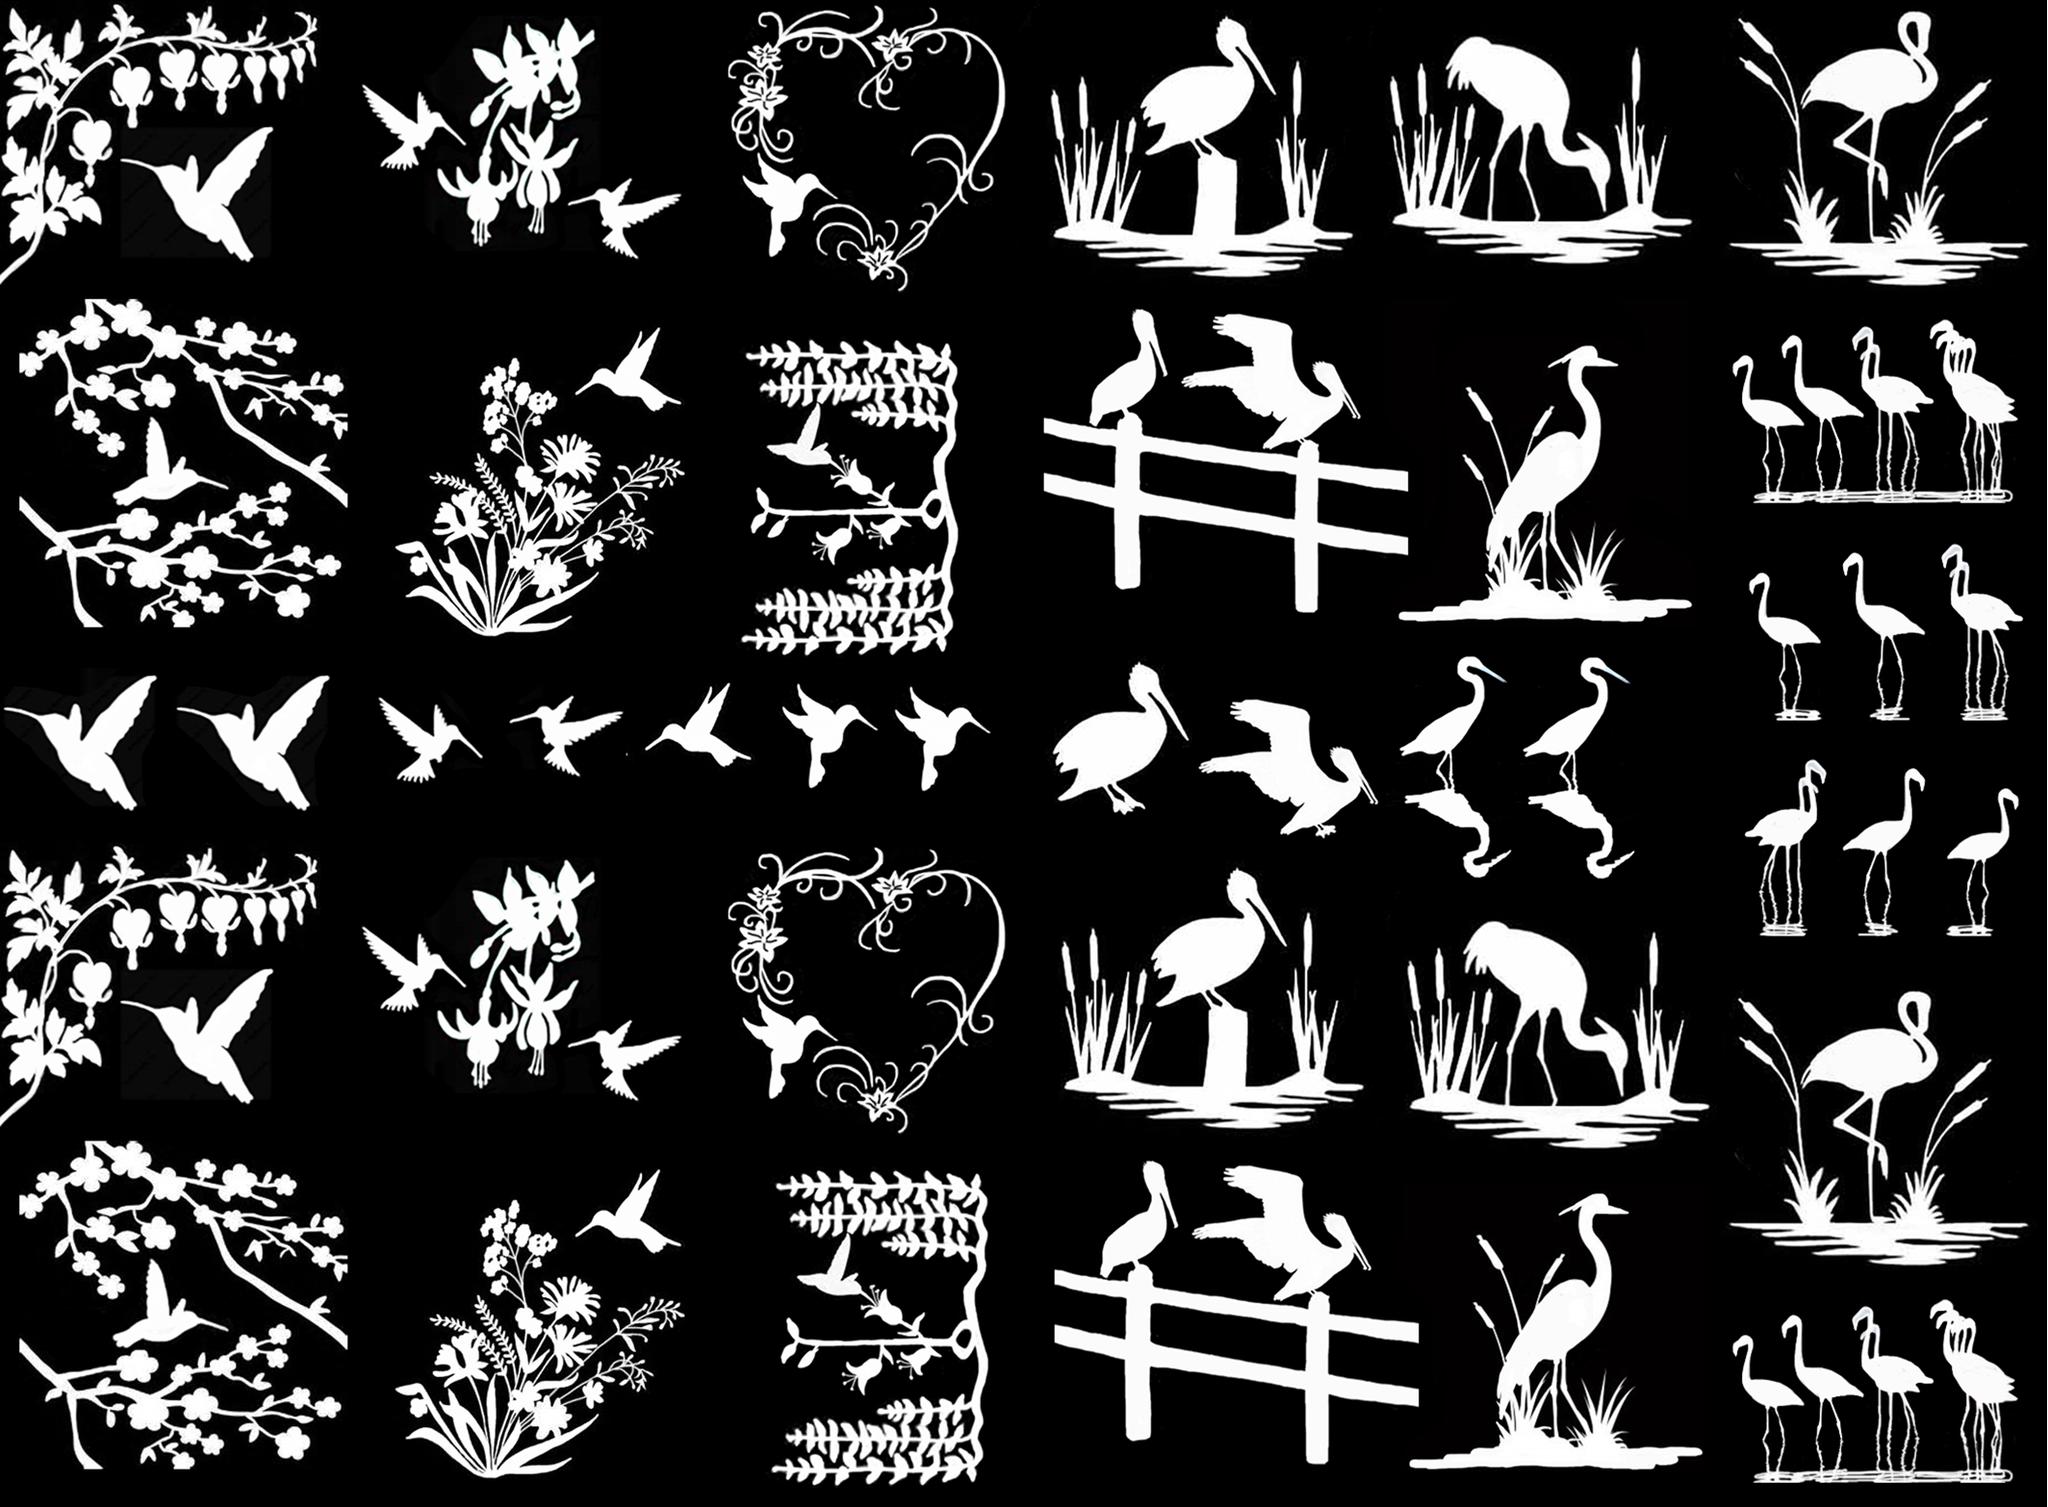 "Birds of a Feather 1/4"" to 1-1/4"" - Black 14CC311 * White 14CC400"